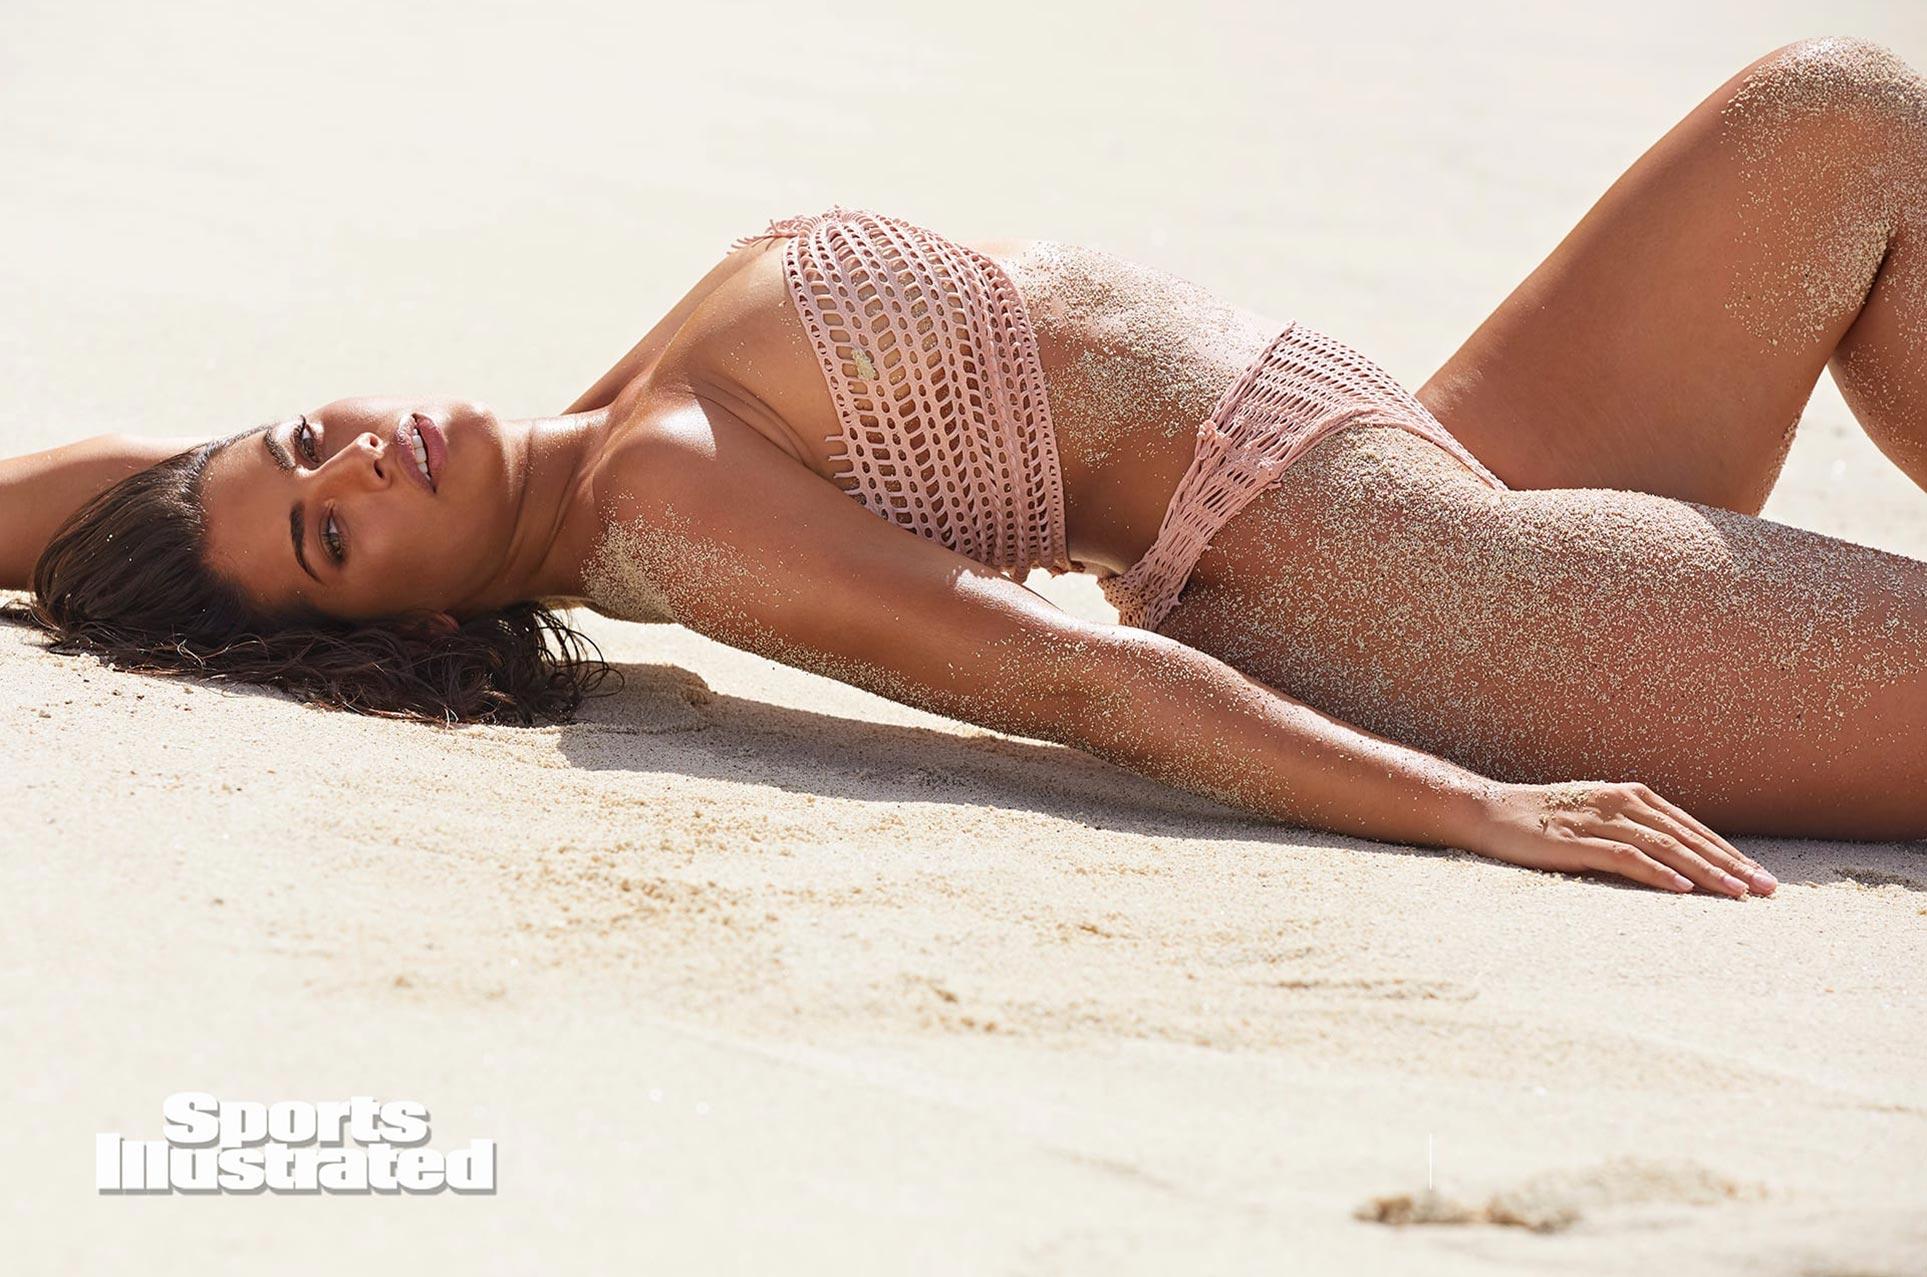 Лорена Дюран в каталоге купальников Sports Illustrated Swimsuit 2020 / фото 09